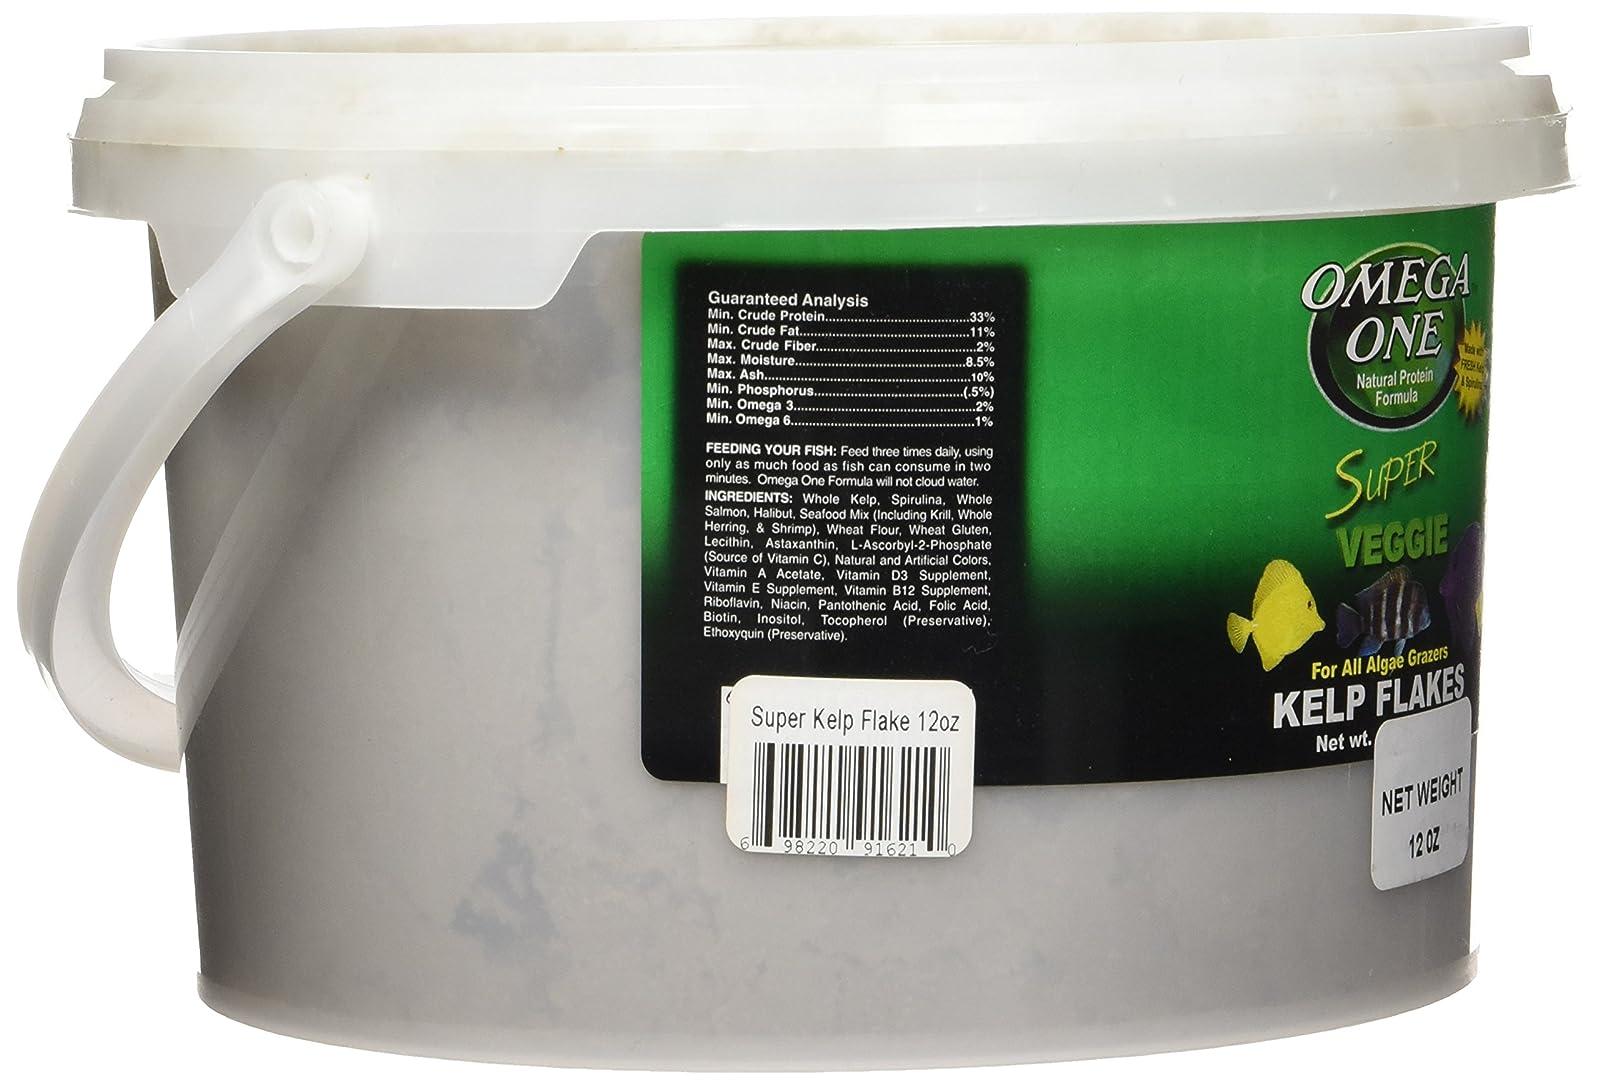 Omega One Super Veggie Kelp Flakes - 12 oz 91621 - 2